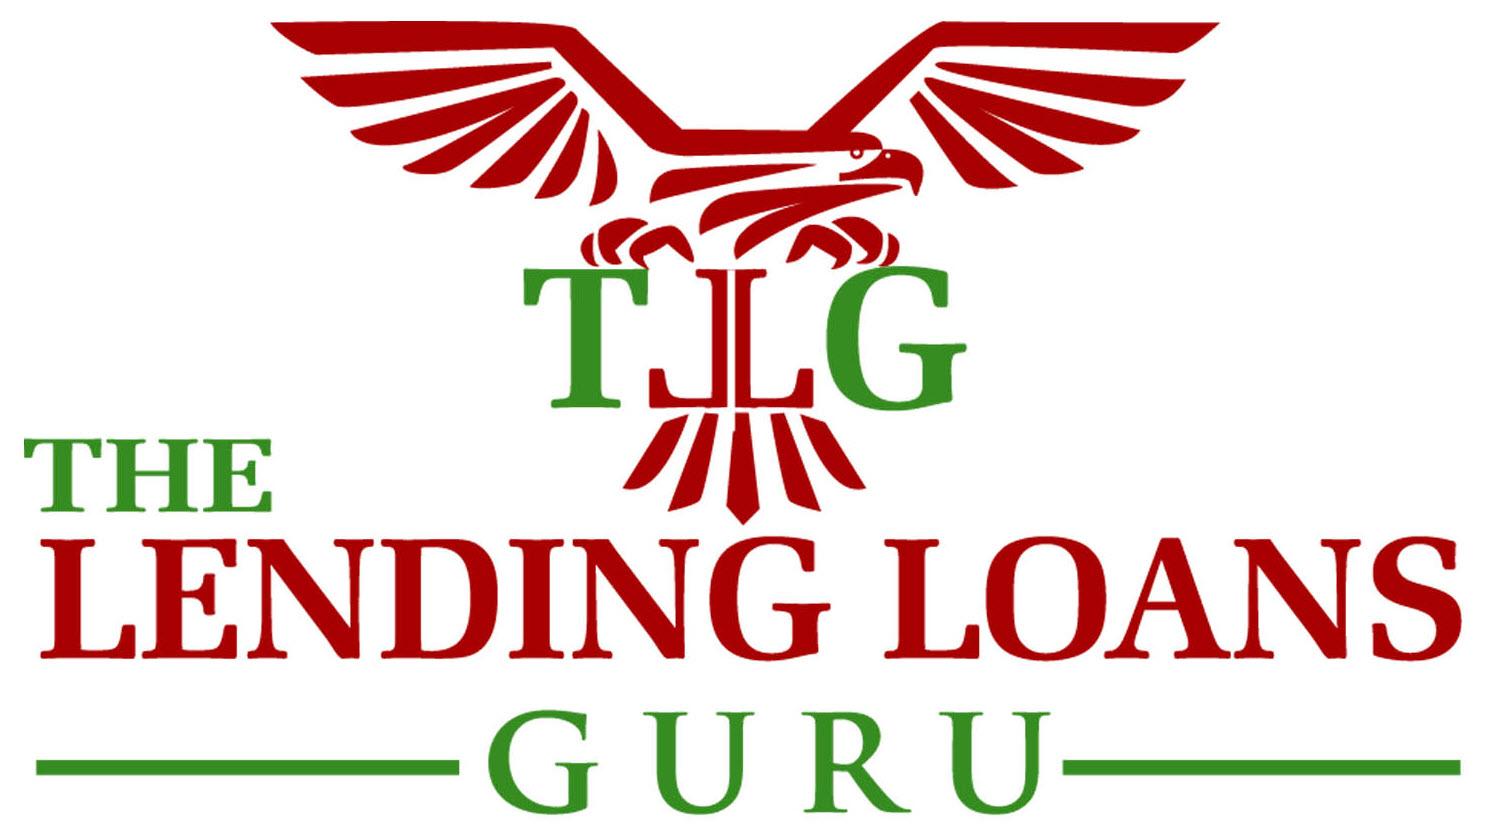 TLG The Lending Loans Guru